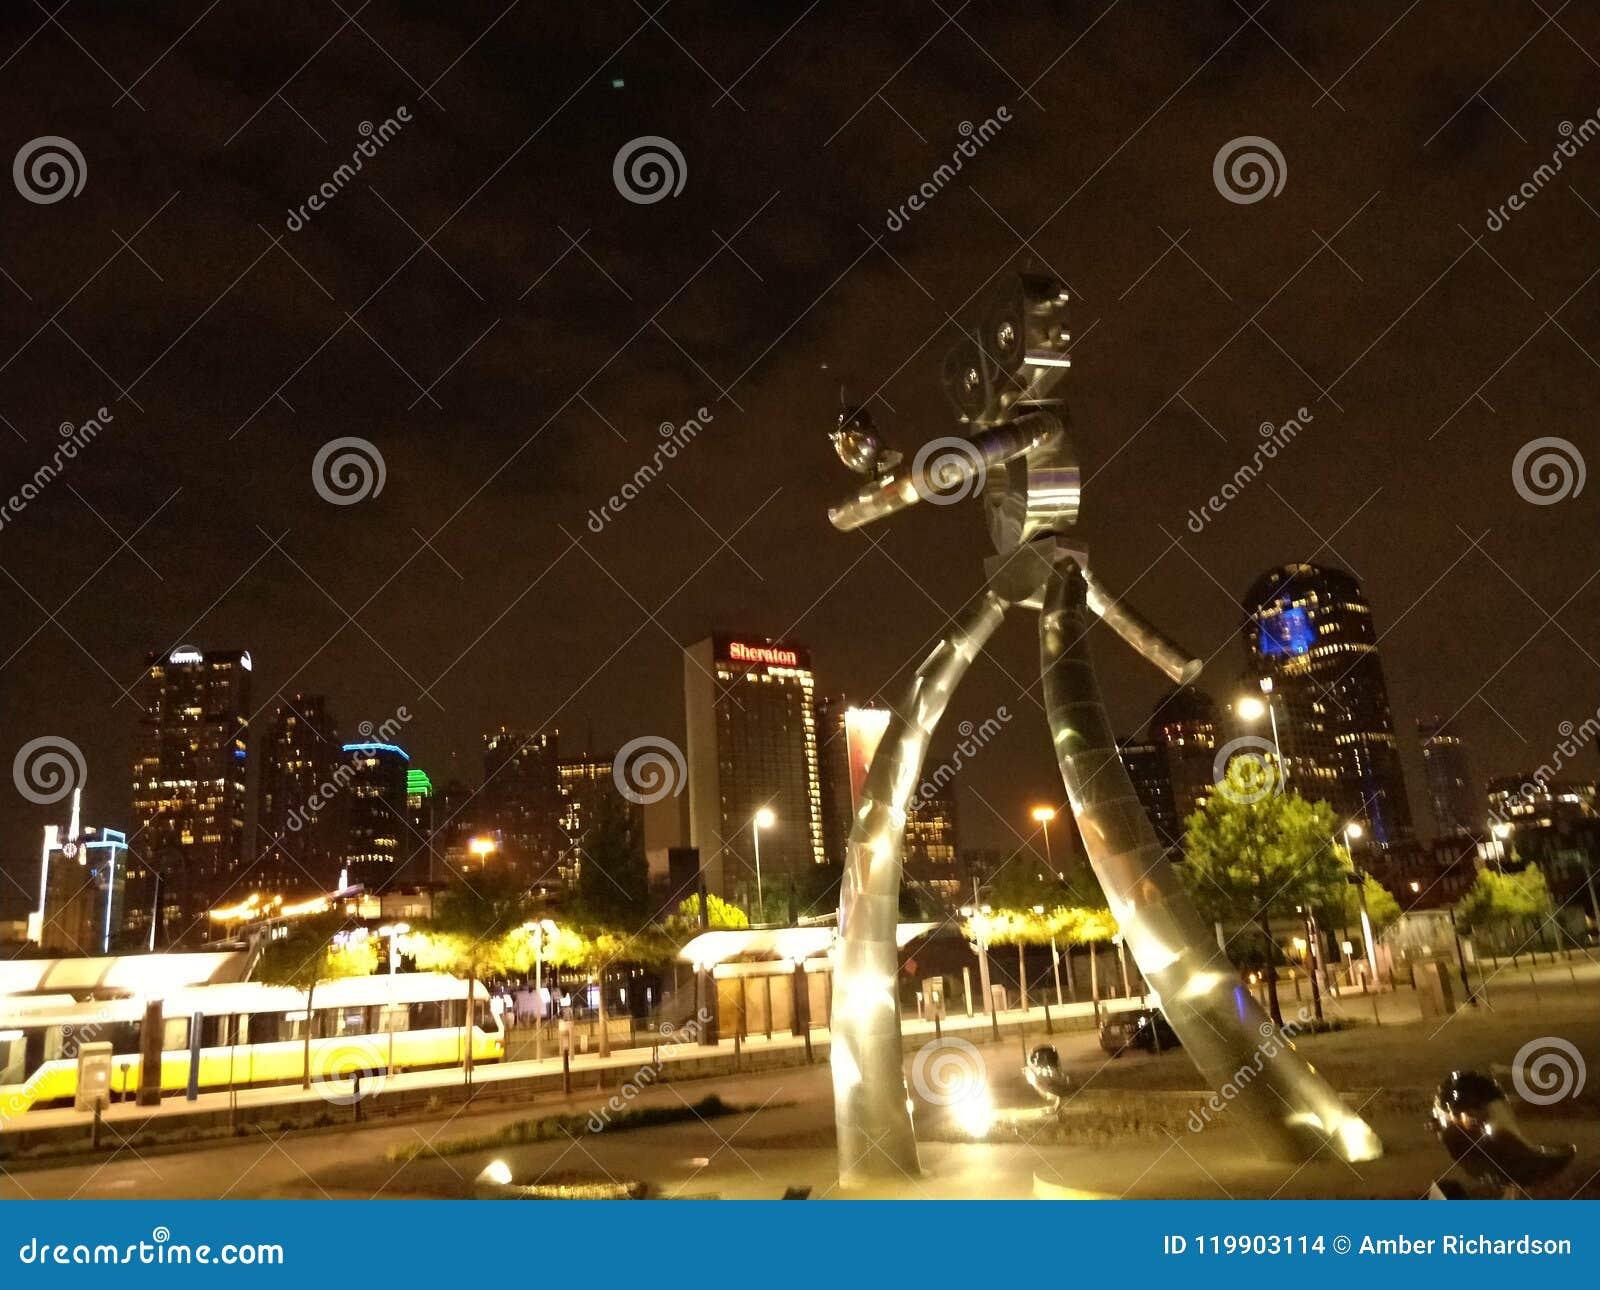 Robot sculpture with Dallas, Tx skyline